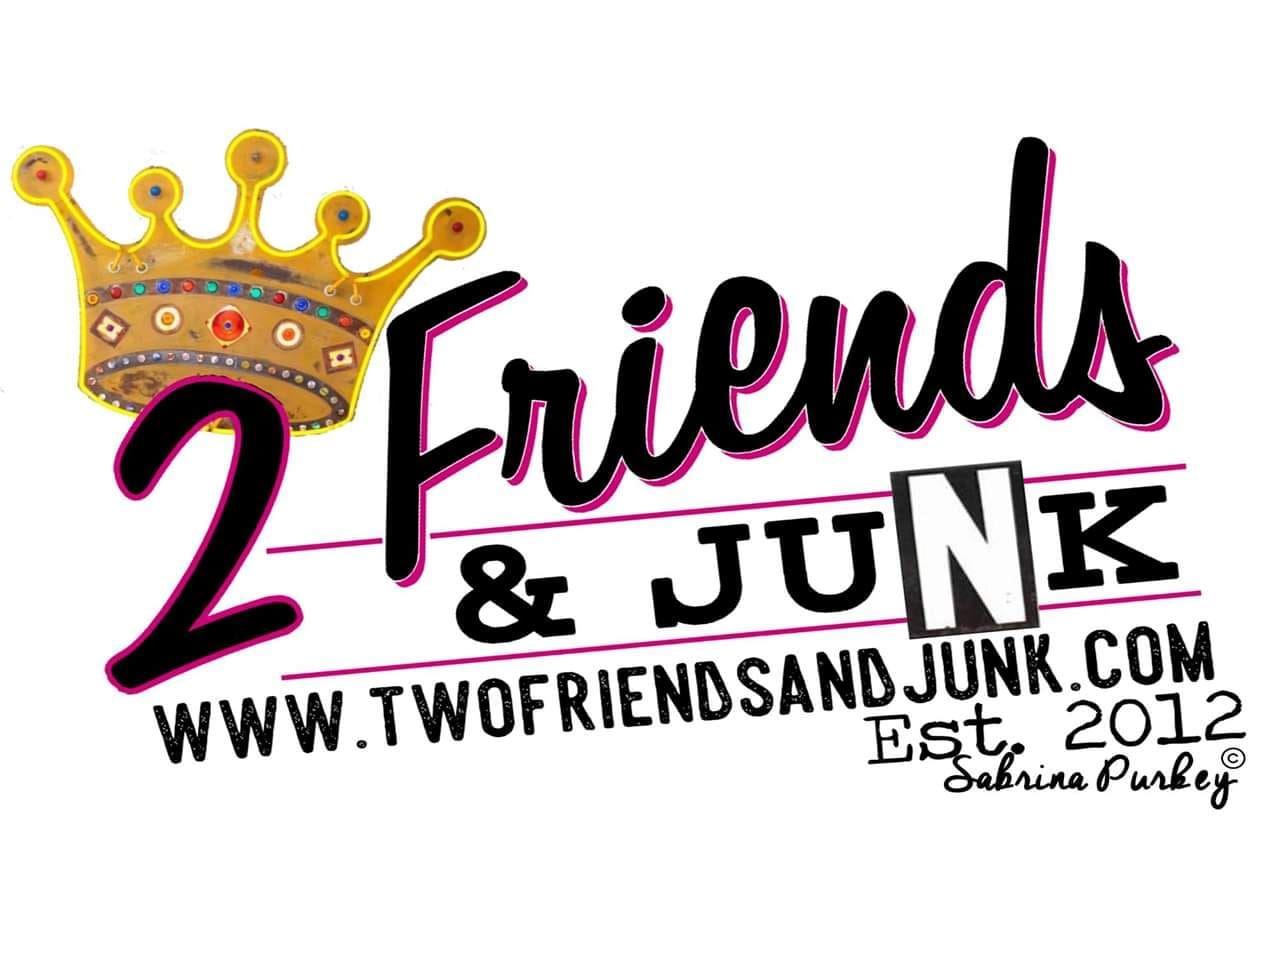 2 Friends & Junk logo